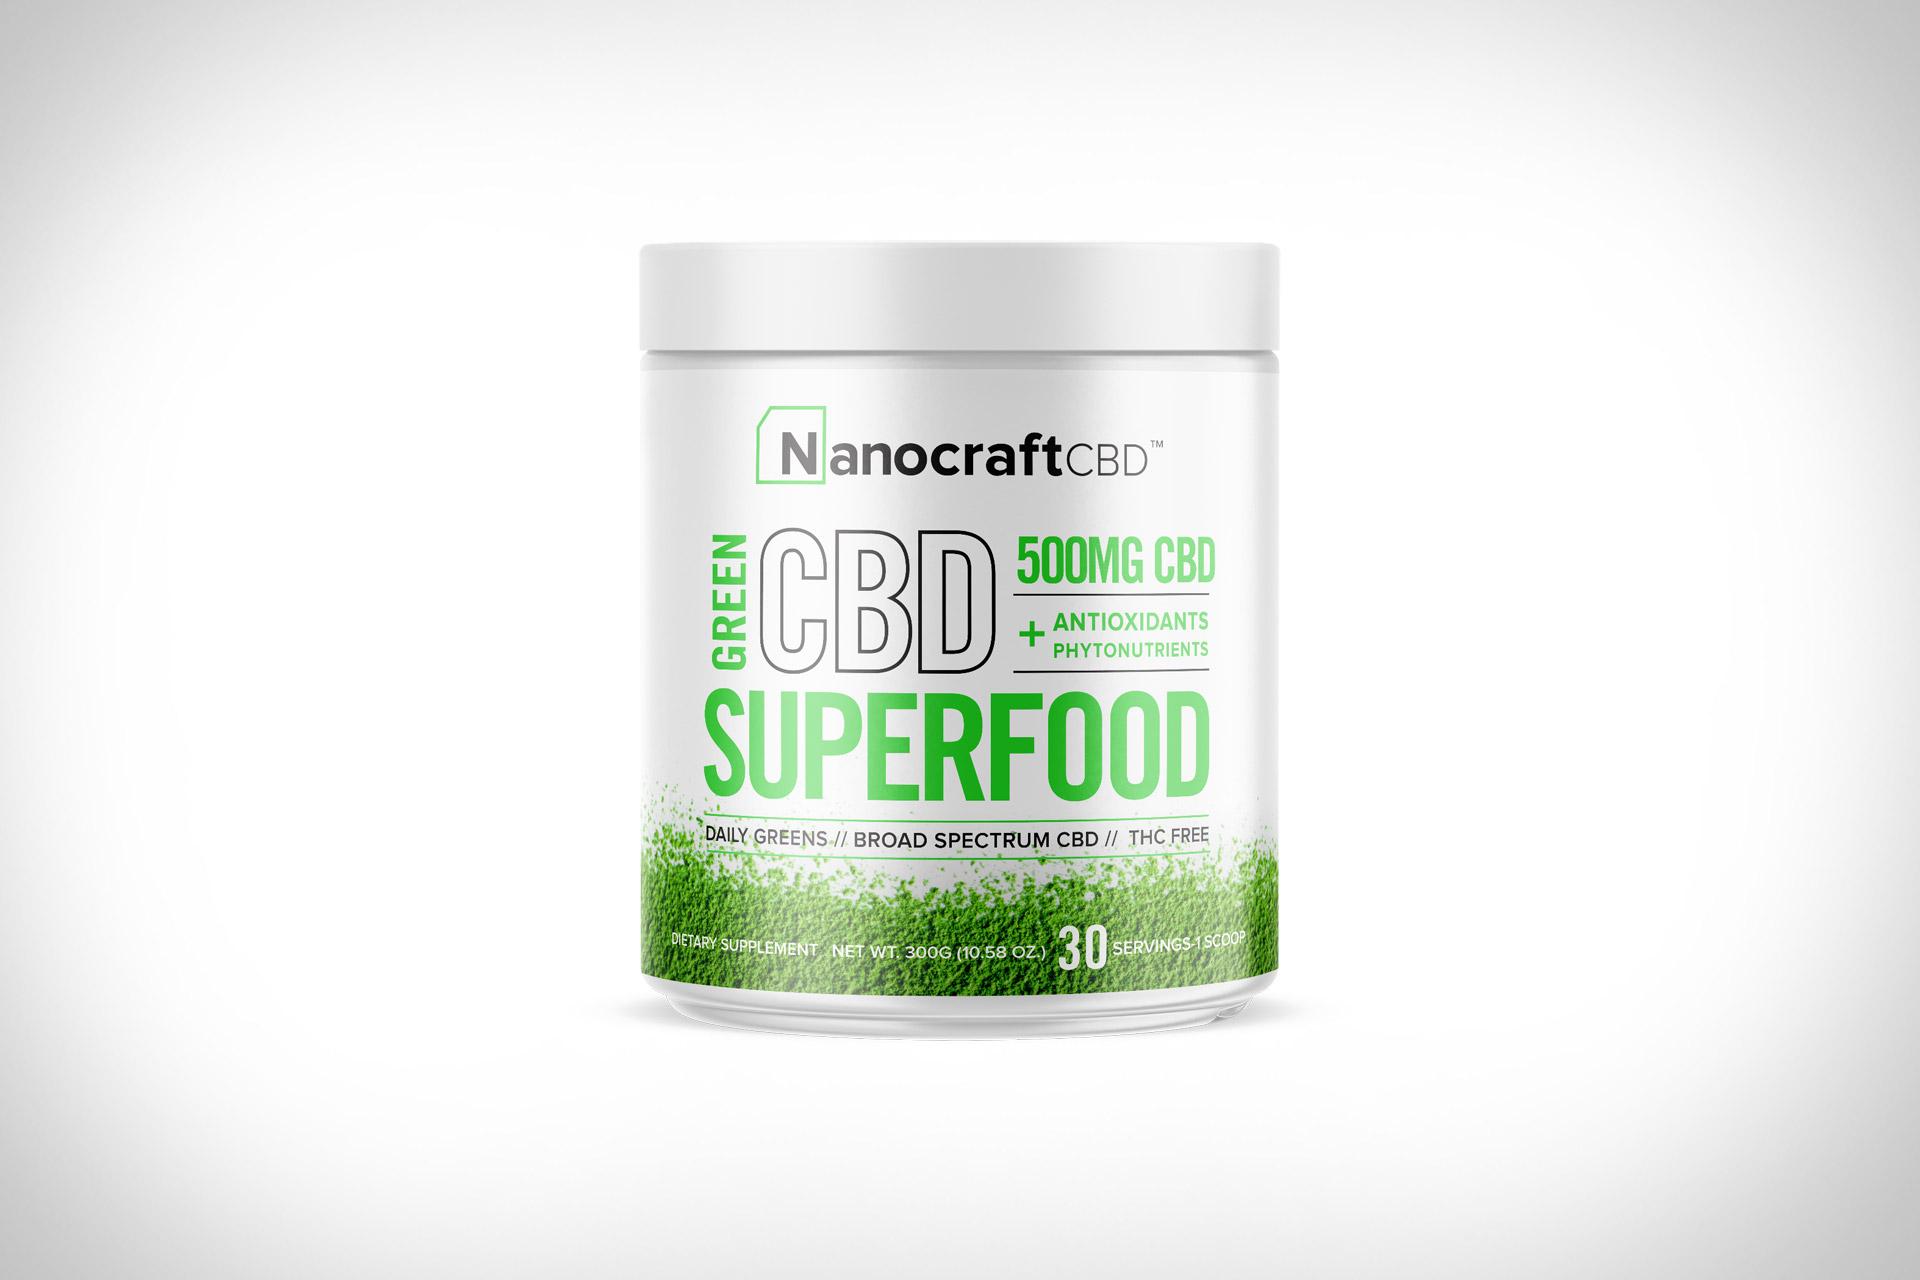 Nanocraft CBD Superfood Green Powder